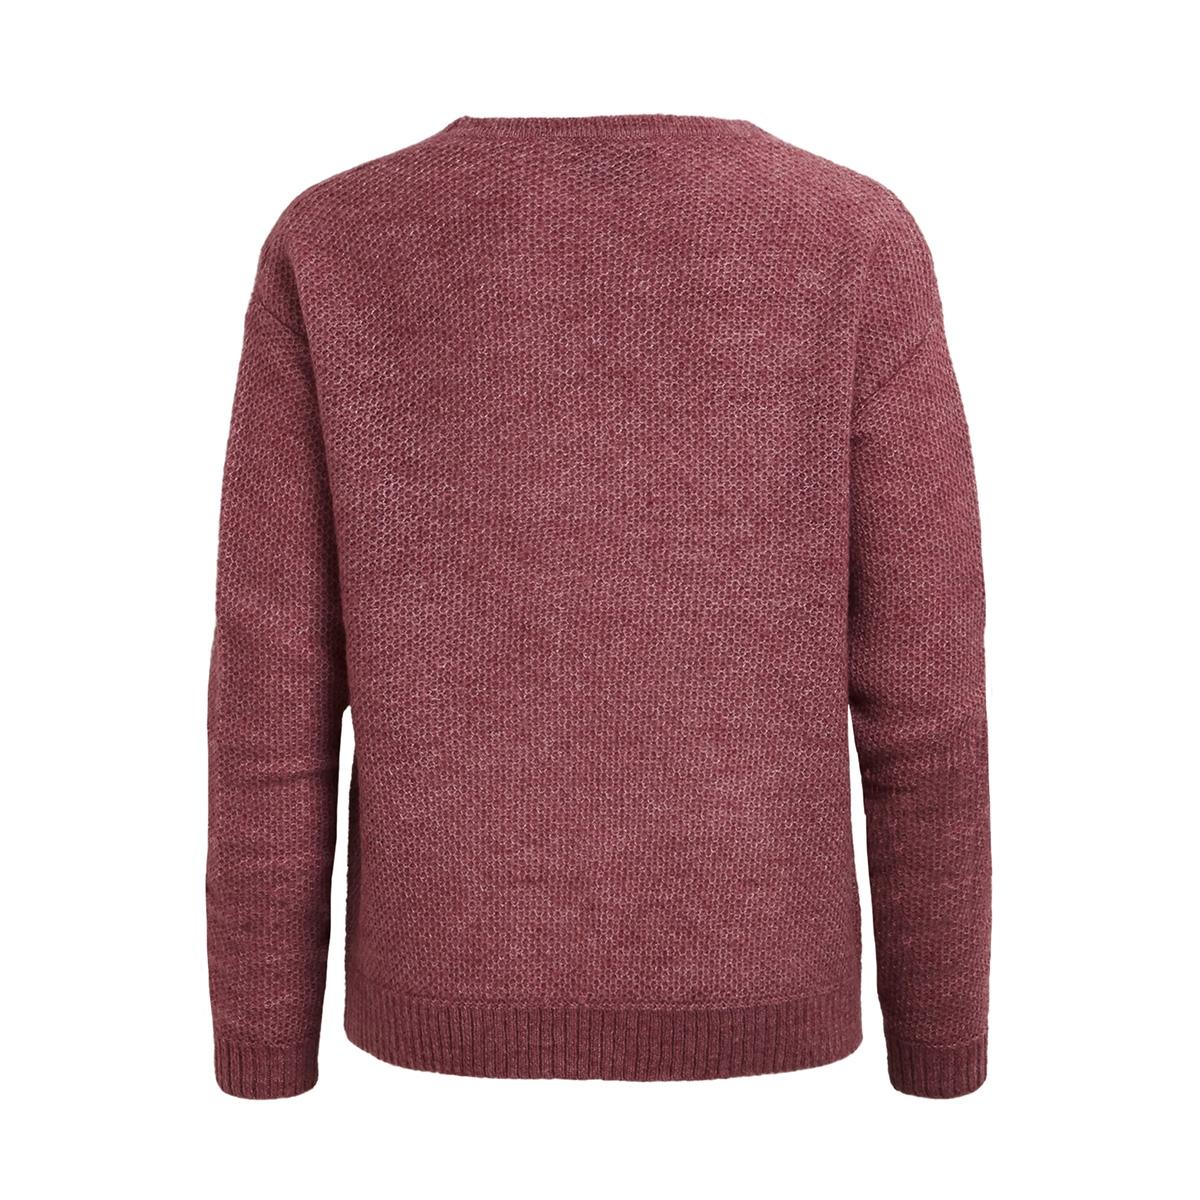 objstorm ada knit pullover 93 23025152 object trui slate rose